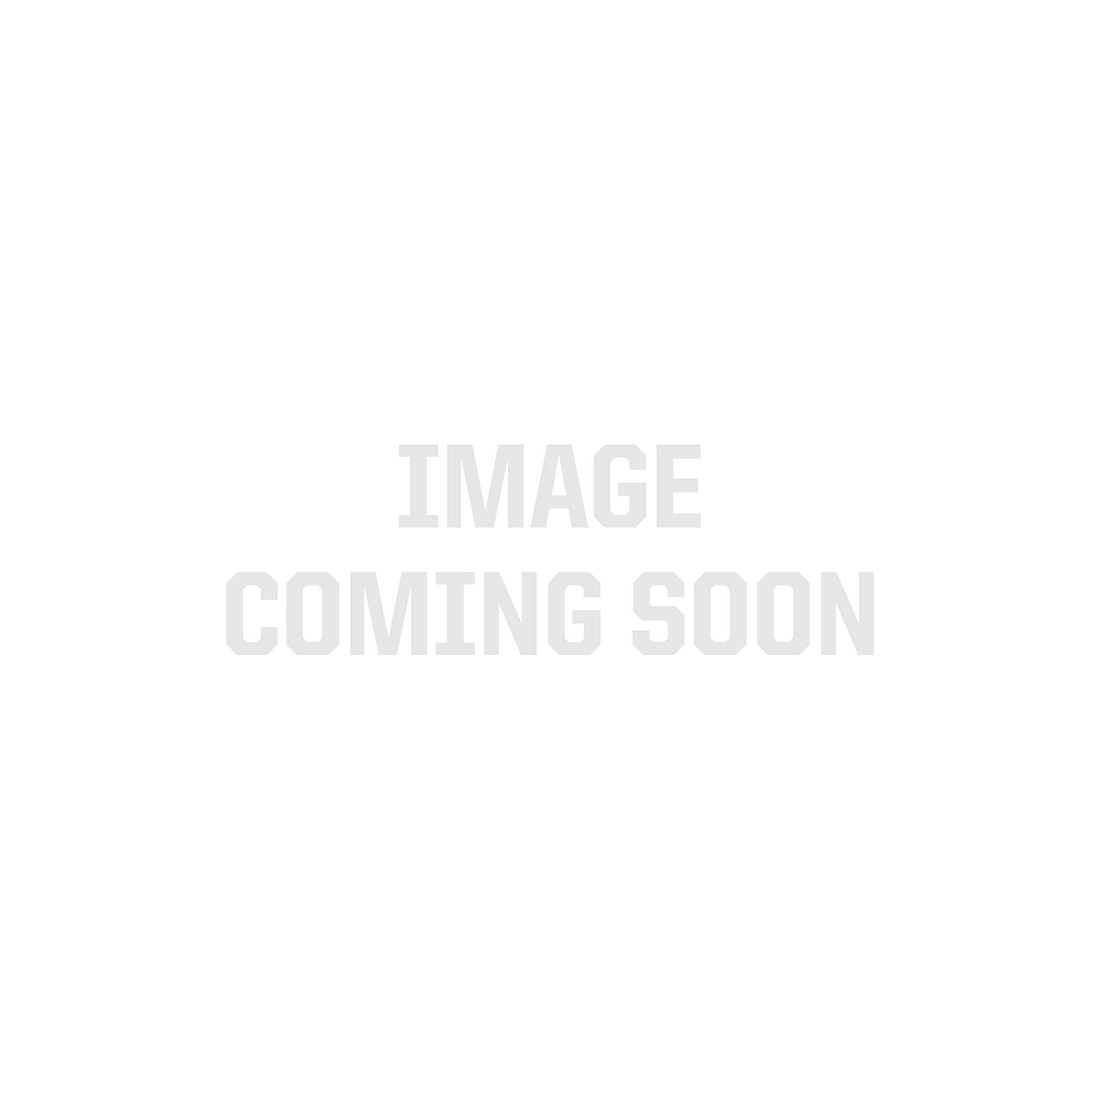 TruColor 2835 CurrentControl LED Strip Light - 2,700K - 80/m - CurrentControl - 10m Reel